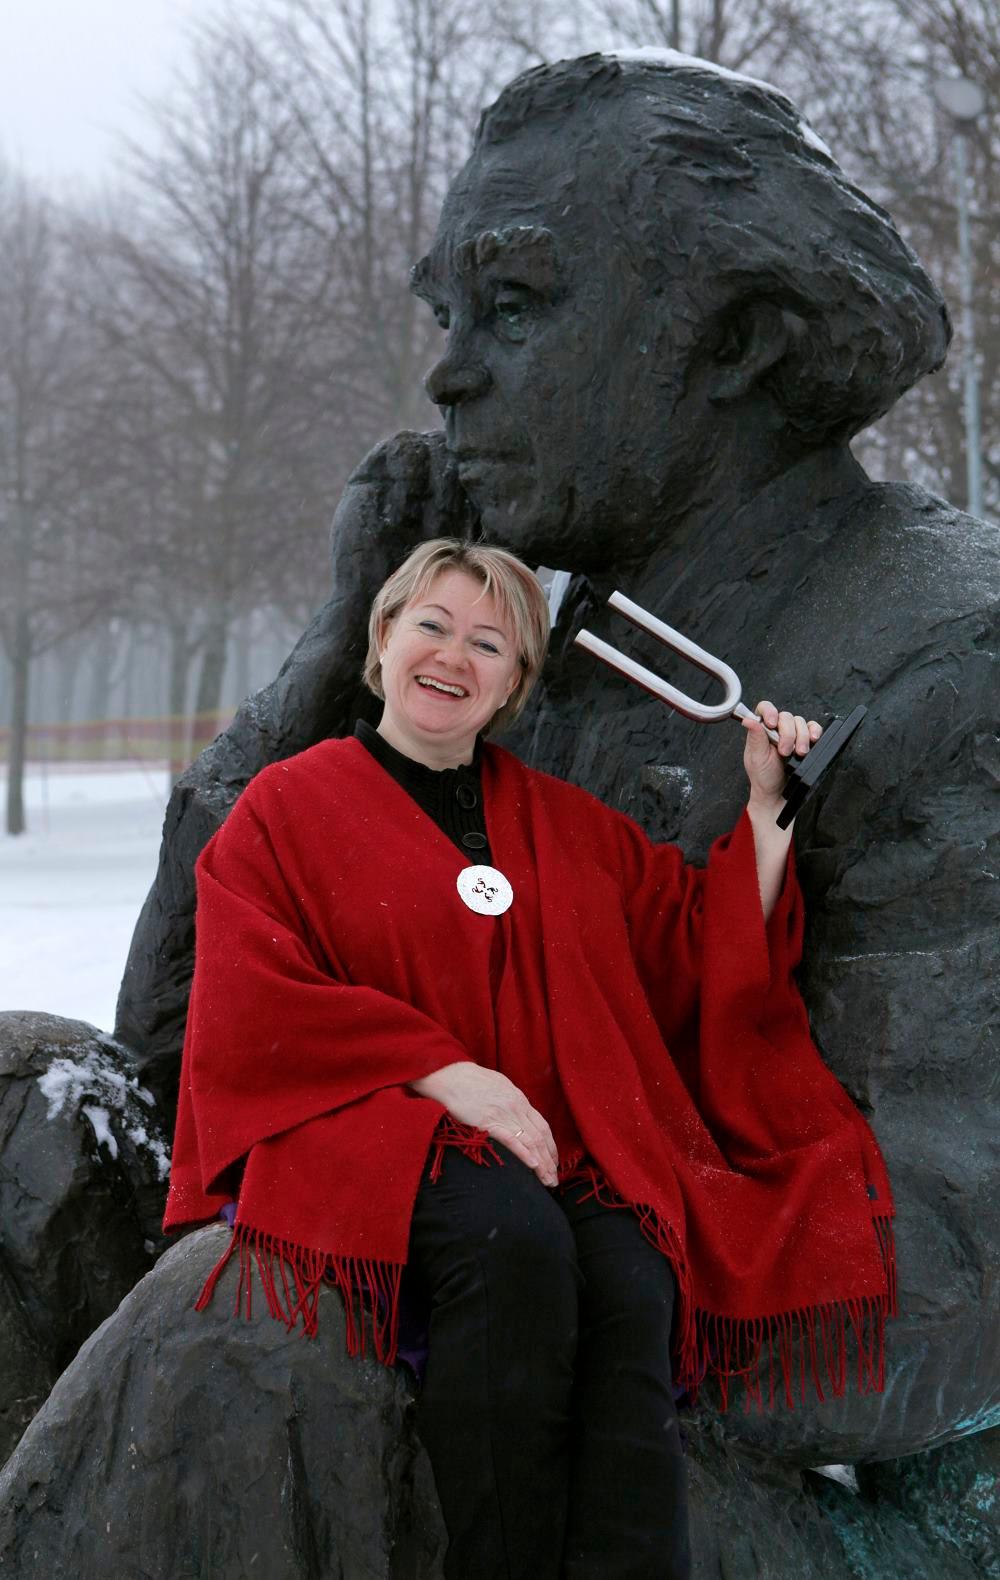 """Lauluisaga"" Gustav Ernesaksa preemiat saades. FOTO SCANPIX / SVEN ARBET"